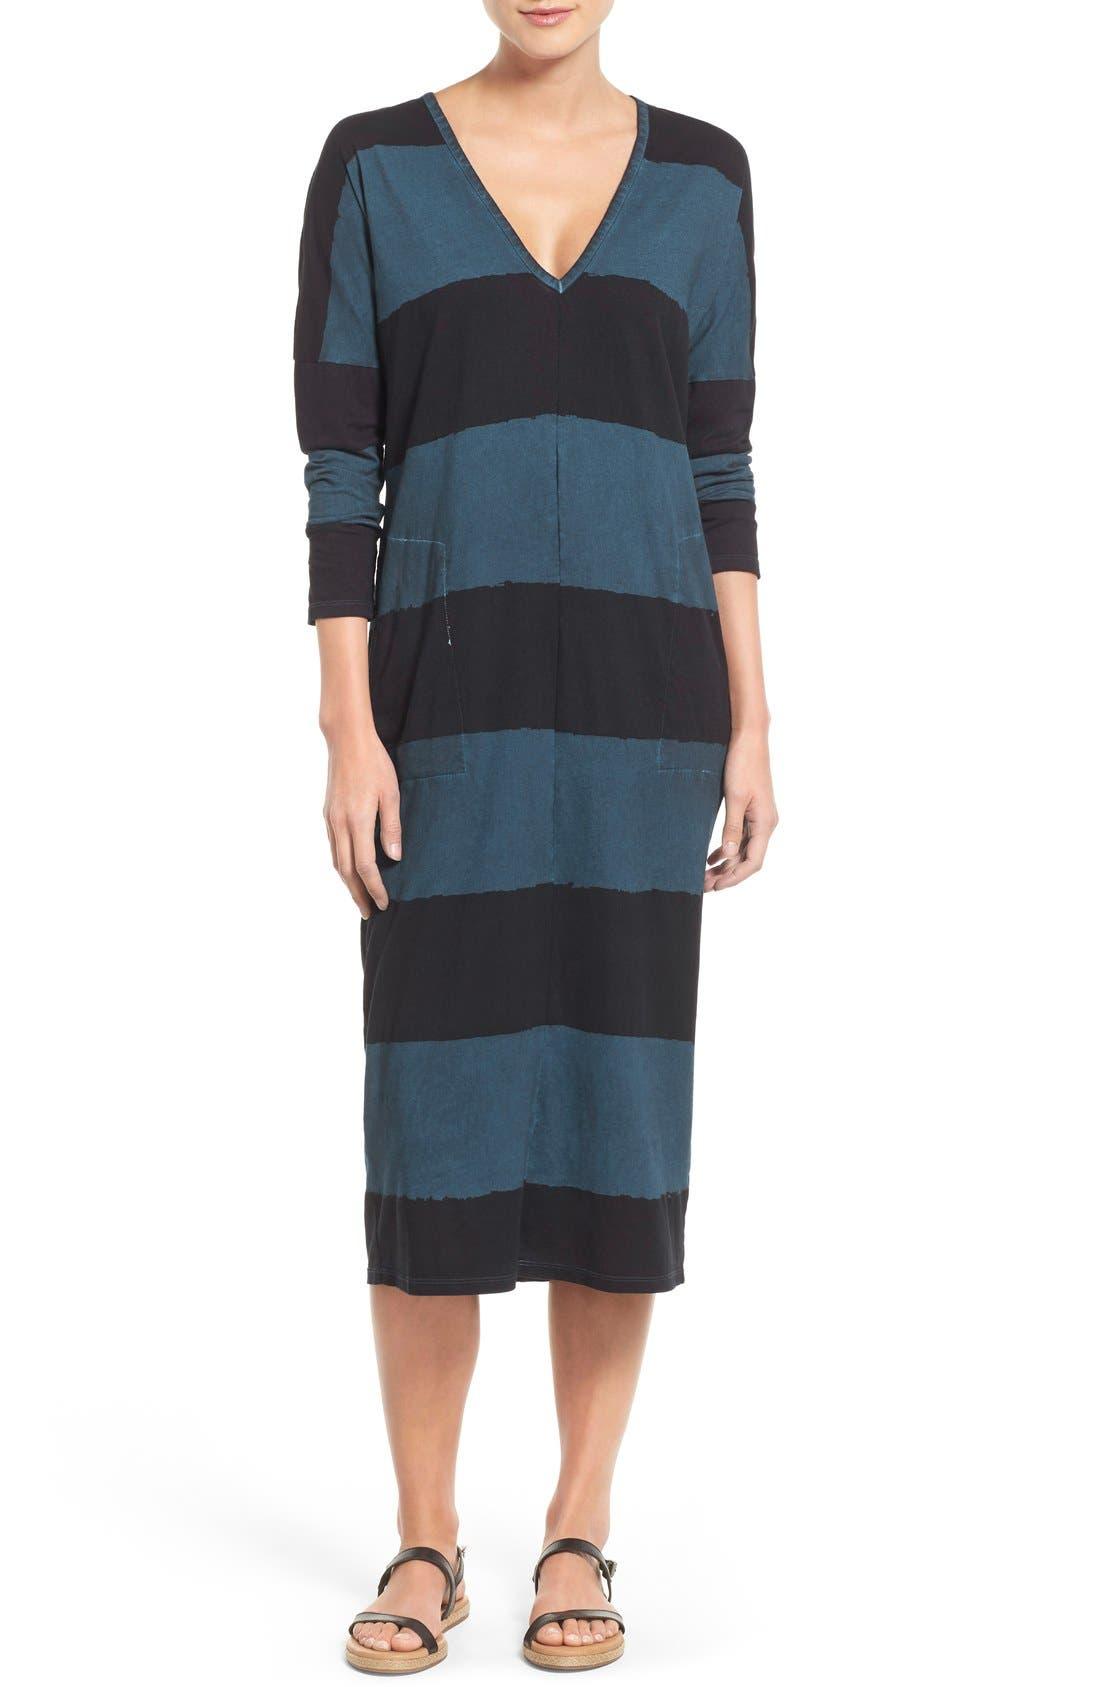 Alternate Image 1 Selected - Lucky Brand Dyed Stripe Cotton Knit Midi Dress